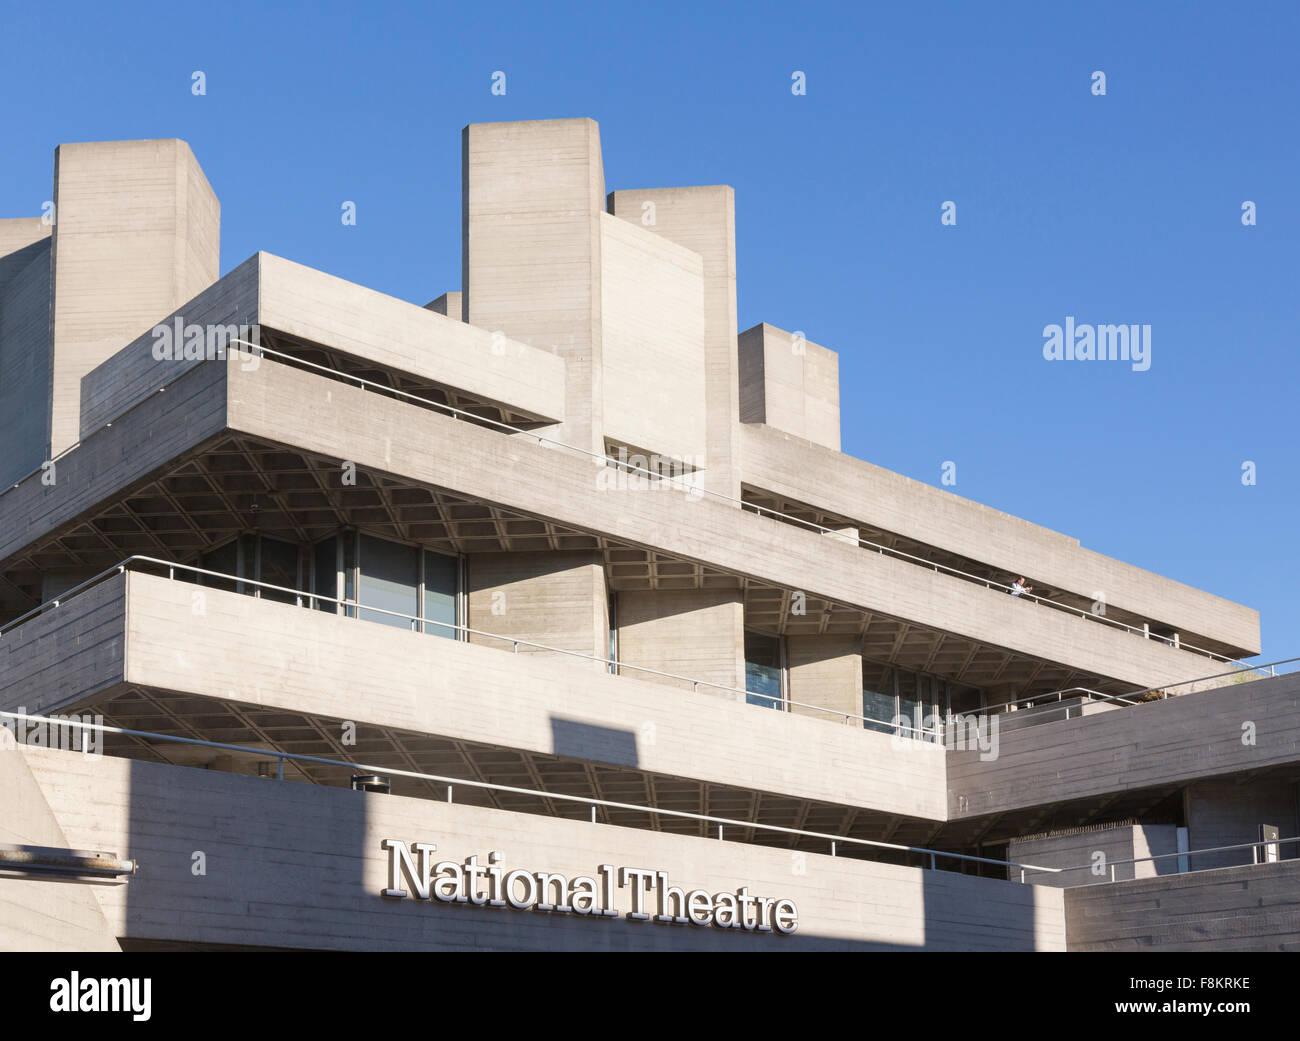 National Theatre, South Bank, London, England, UK - Stock Image